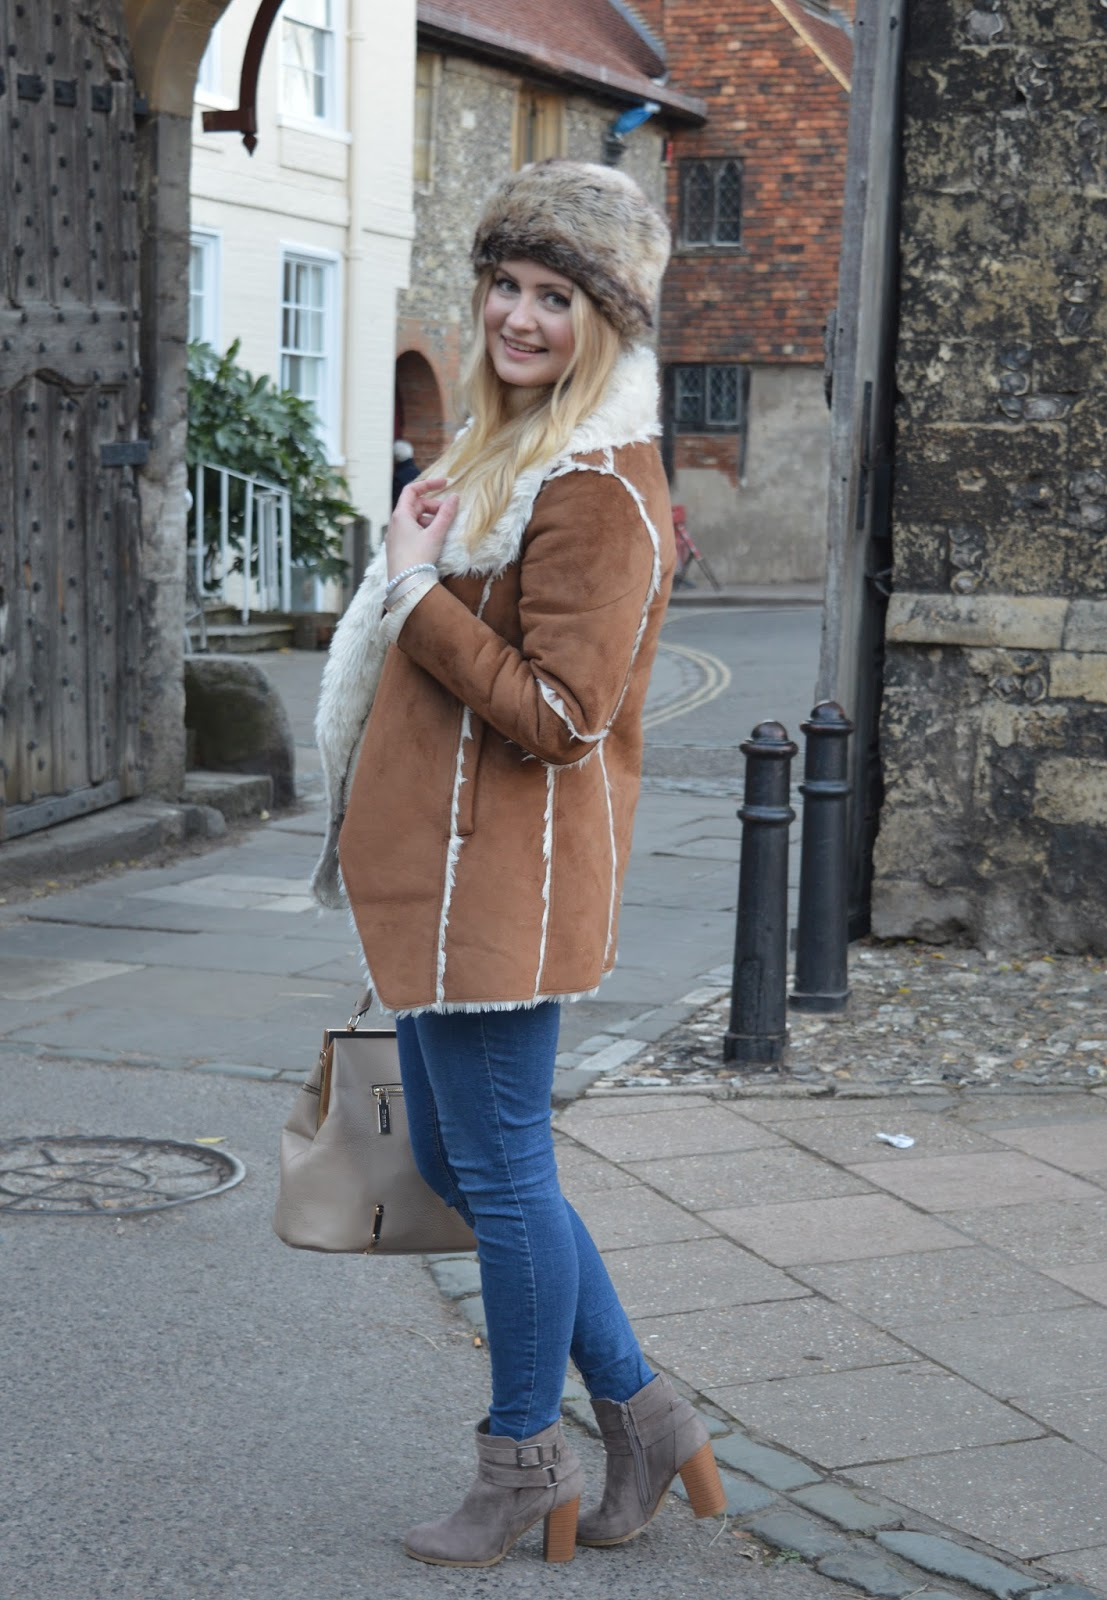 Winter fashion ideas, fashion bloggers, Hampshire bloggers, style bloggers, fashion blogs